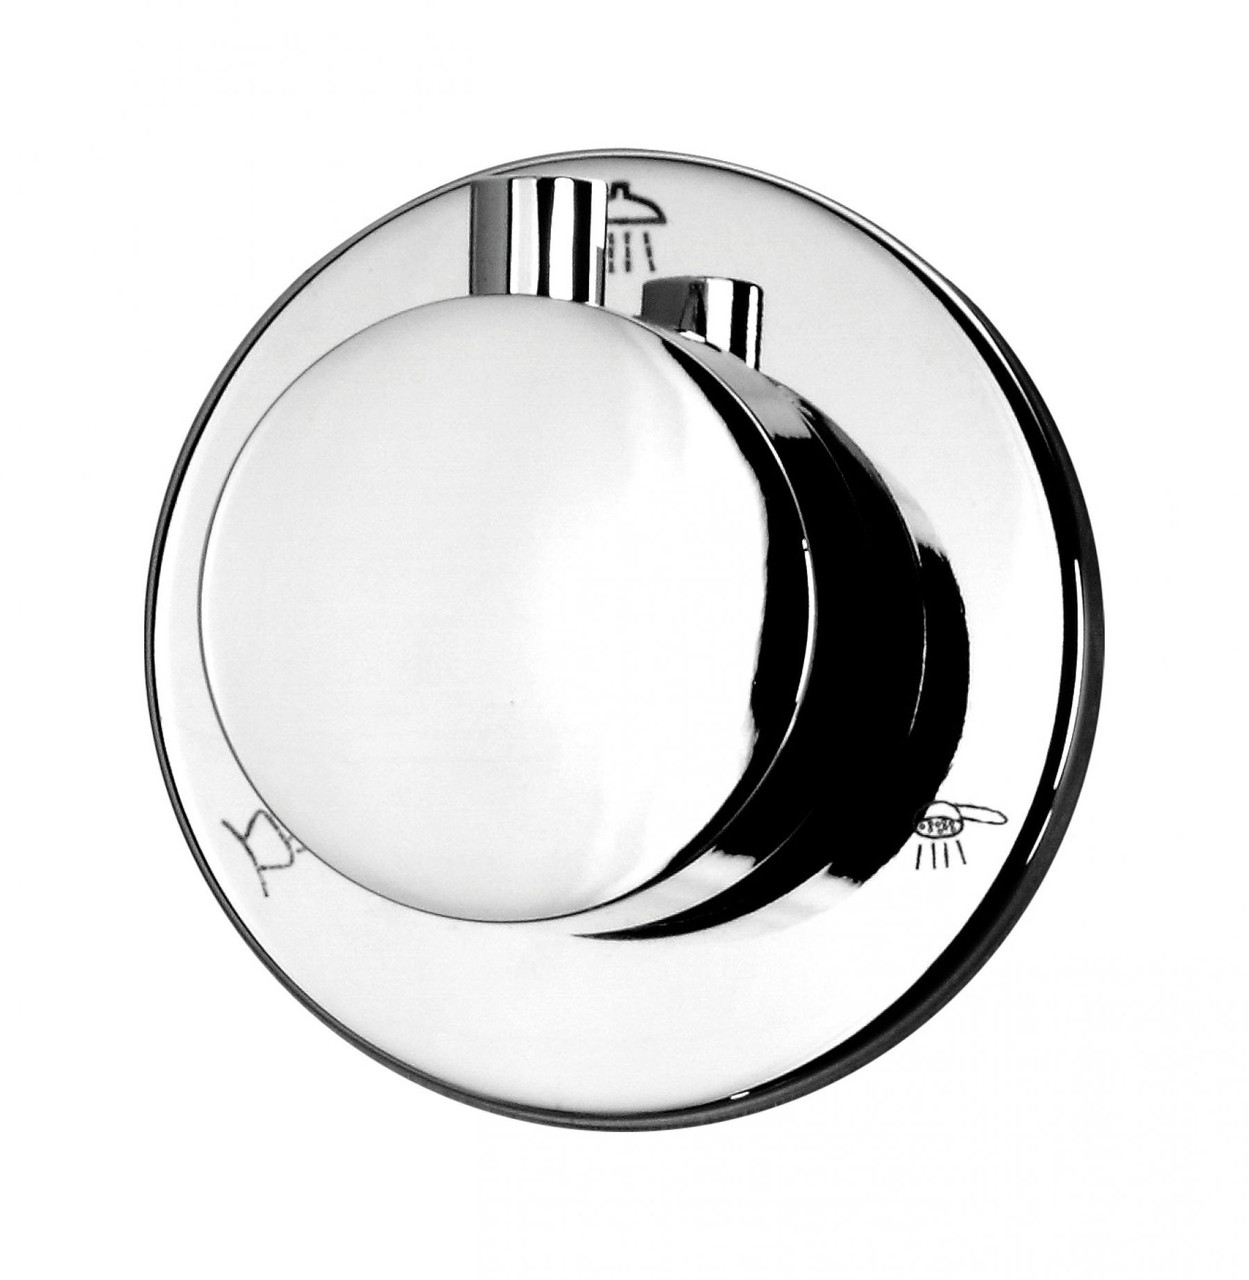 Перемикач функцій душа Deante MULTI-SYSTEM, 3-функціональний, круглий